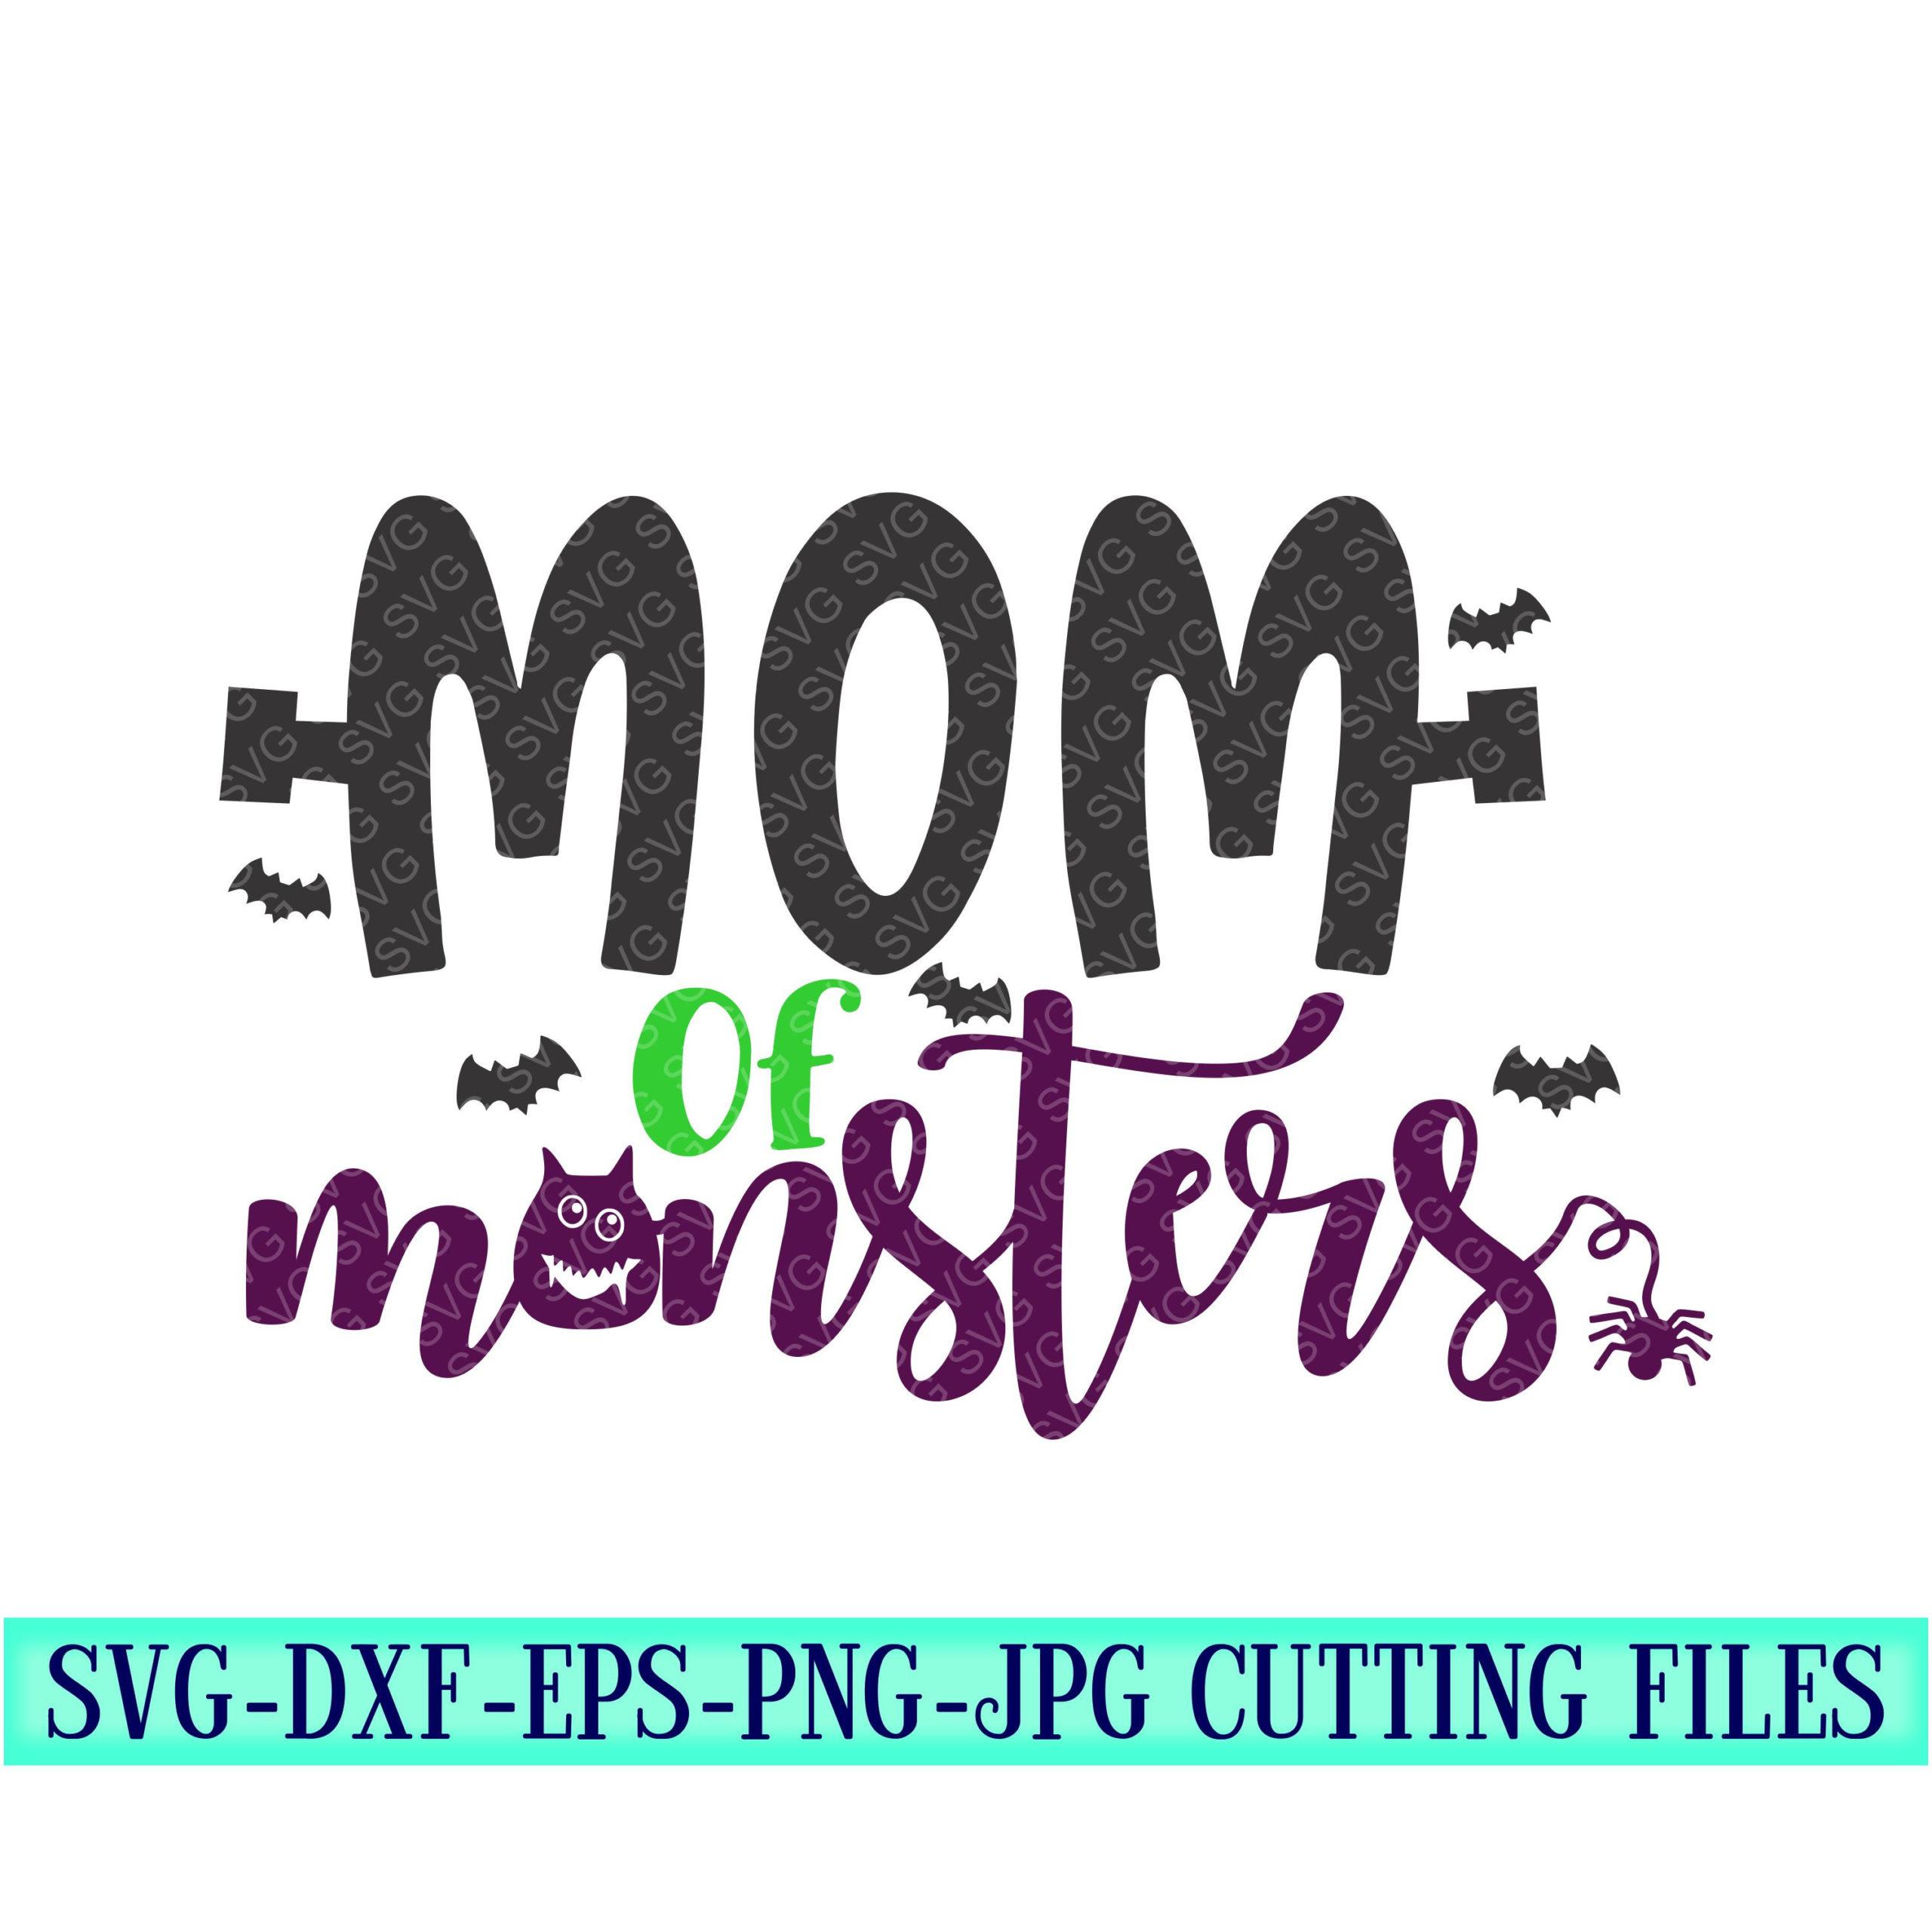 Mom-of-monsters-svg-halloween-mom-svg-mom-svg-momster-svg-halloween-svg-designs-halloween-cut-files-svg-for-mobile-cricut-svg-2-5f6f7b7f